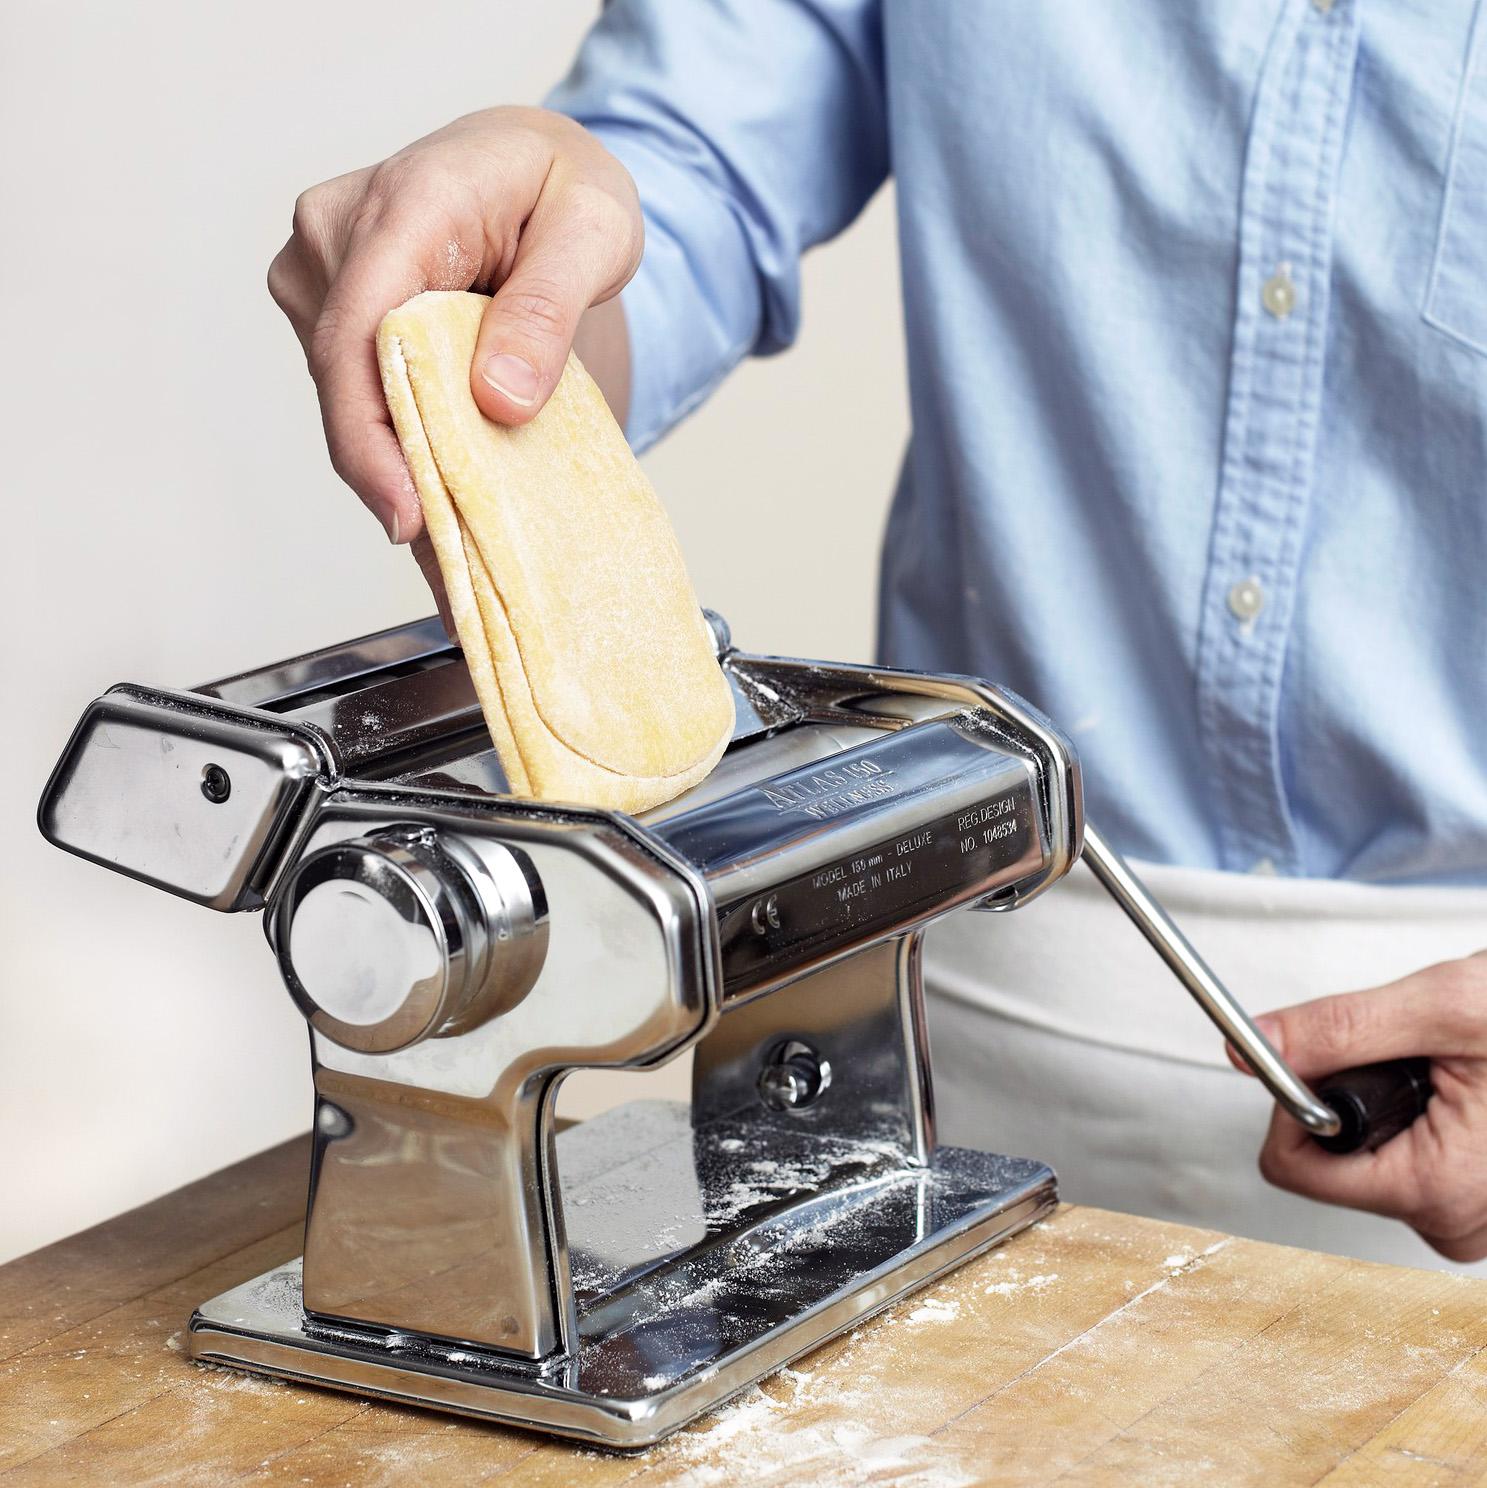 fold dough in half and run through pasta machine again